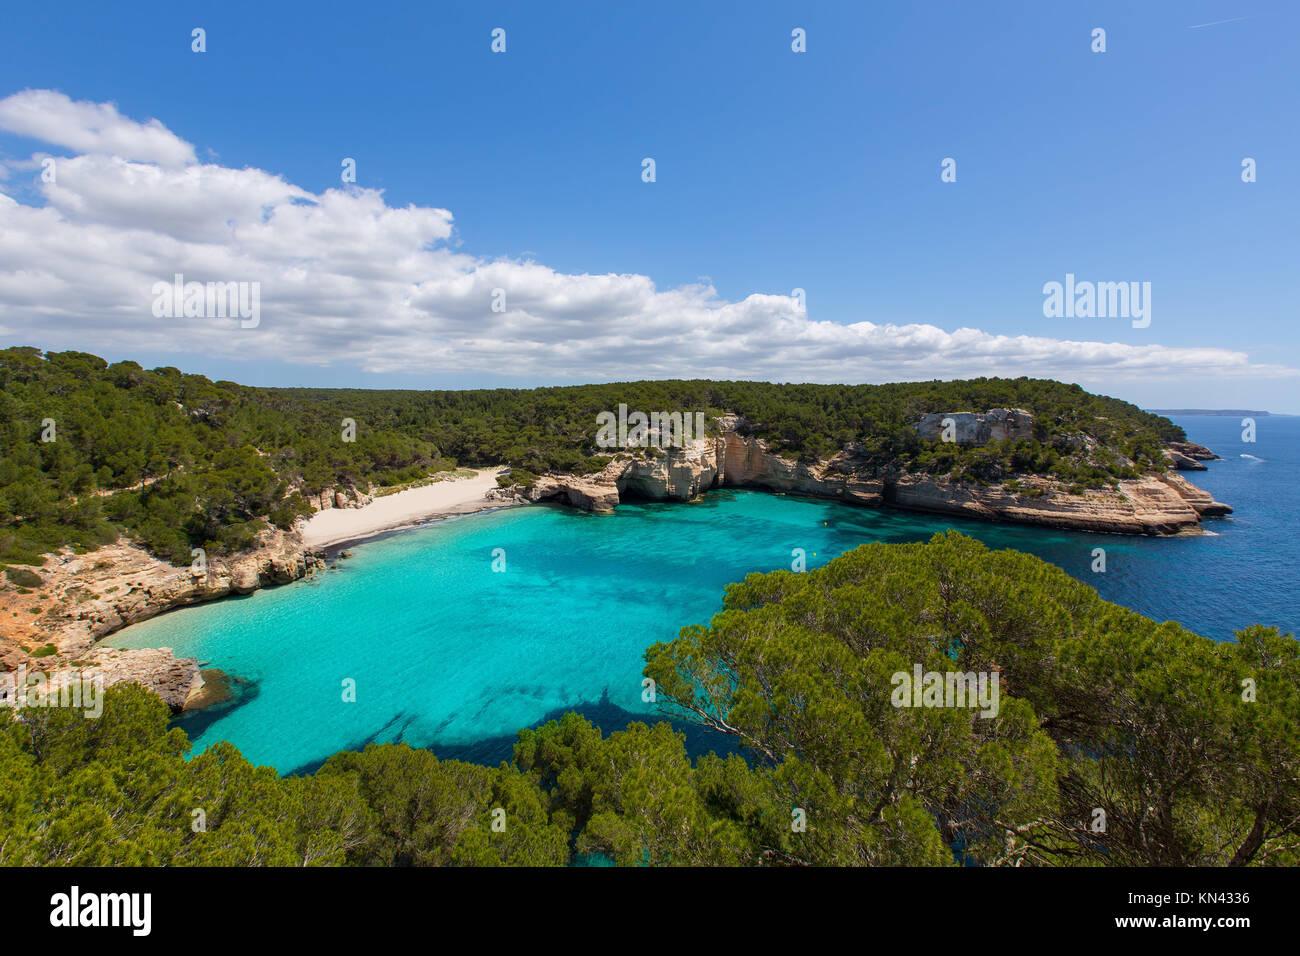 Cala Mitjaneta in Menorca Ciutadella at Balearic islands. - Stock Image